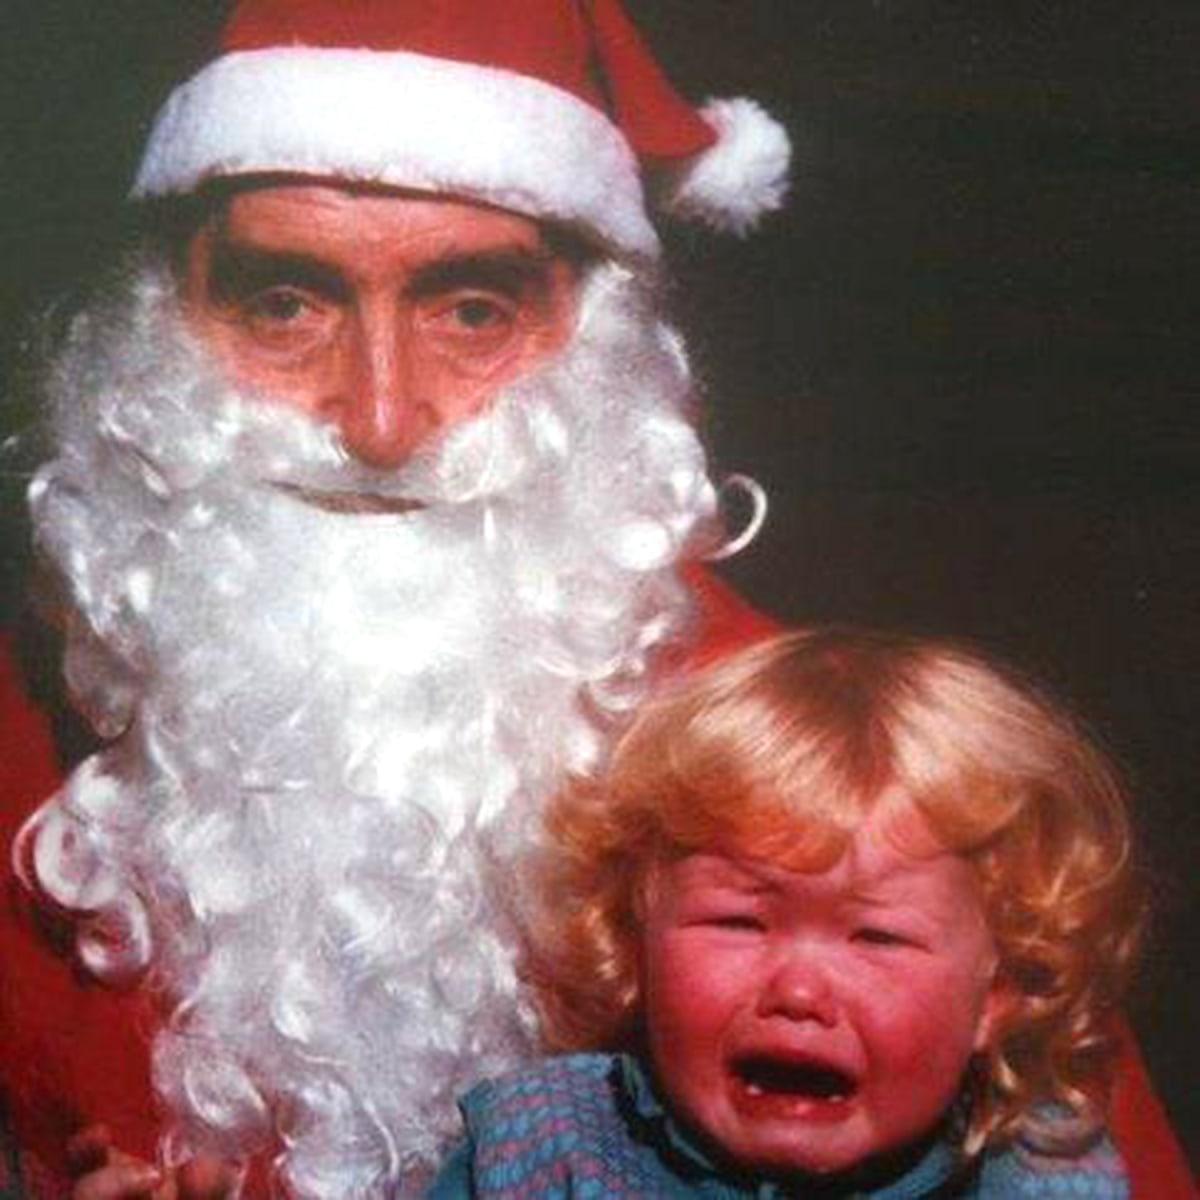 Kids scared of Santa: 15 photos of hilarious ho-ho-horror ...